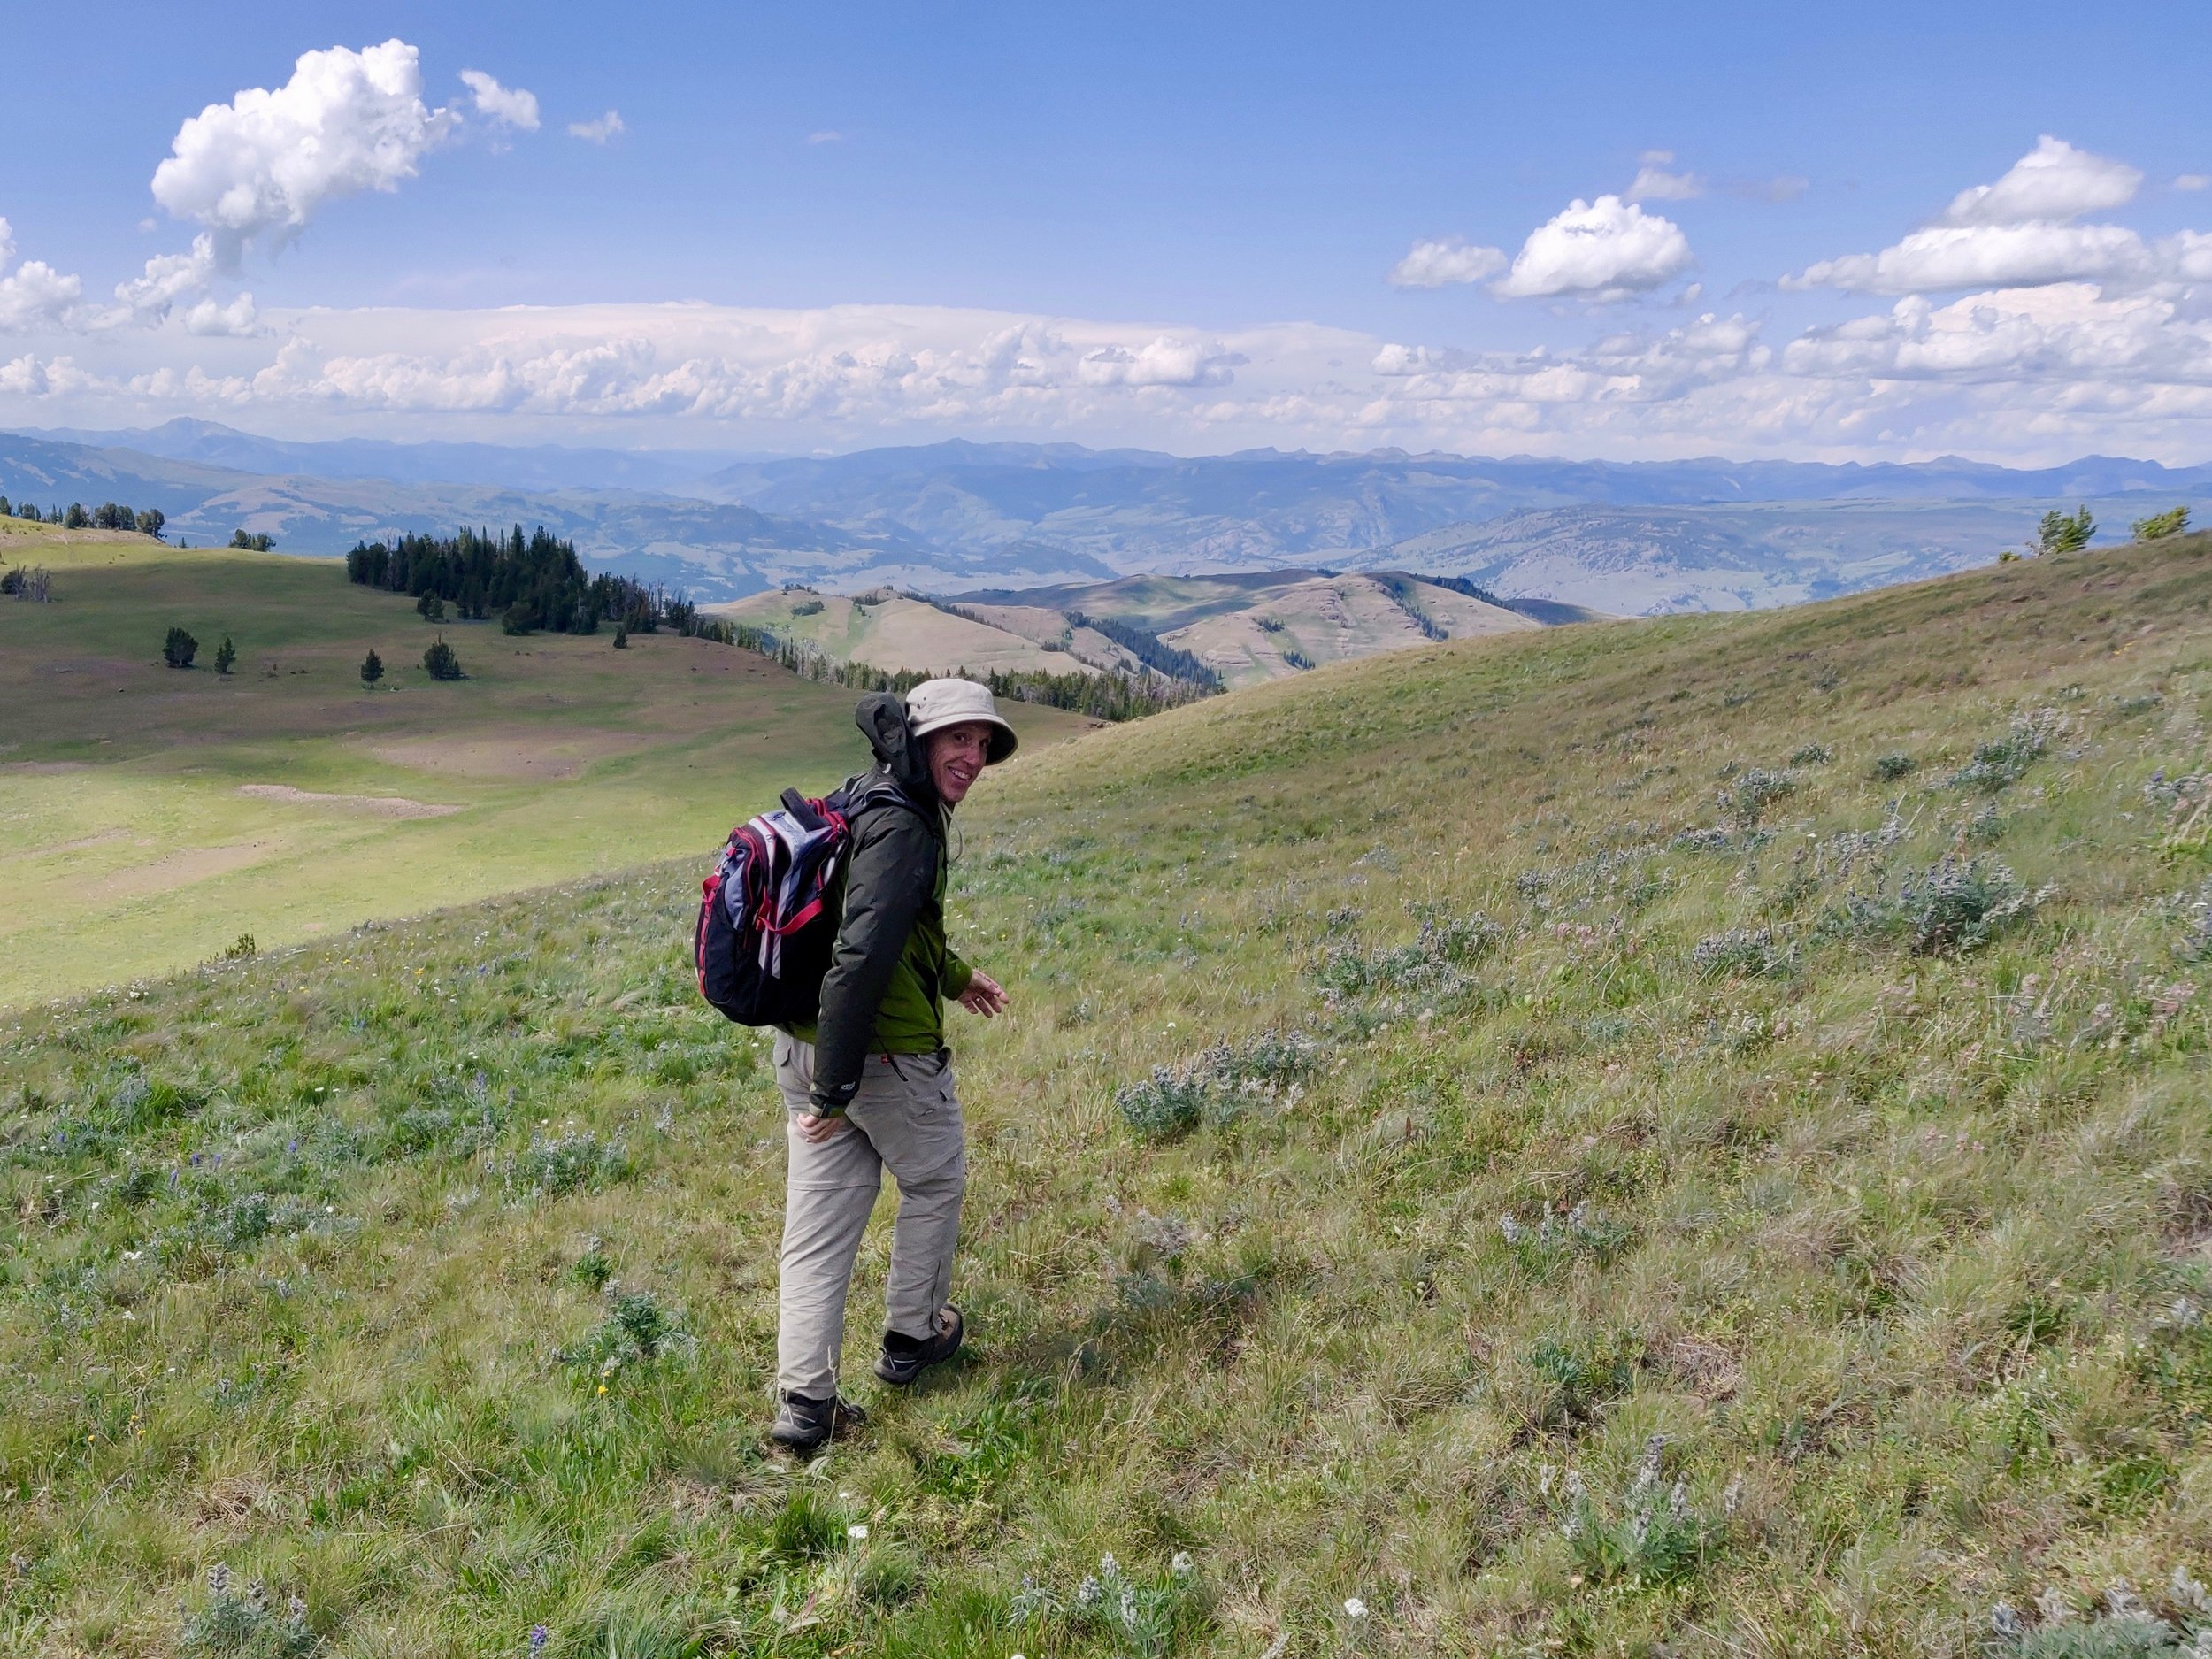 An 11 mile gradual climb. 3,300 foot elevation gain (believe me that's a lot!)